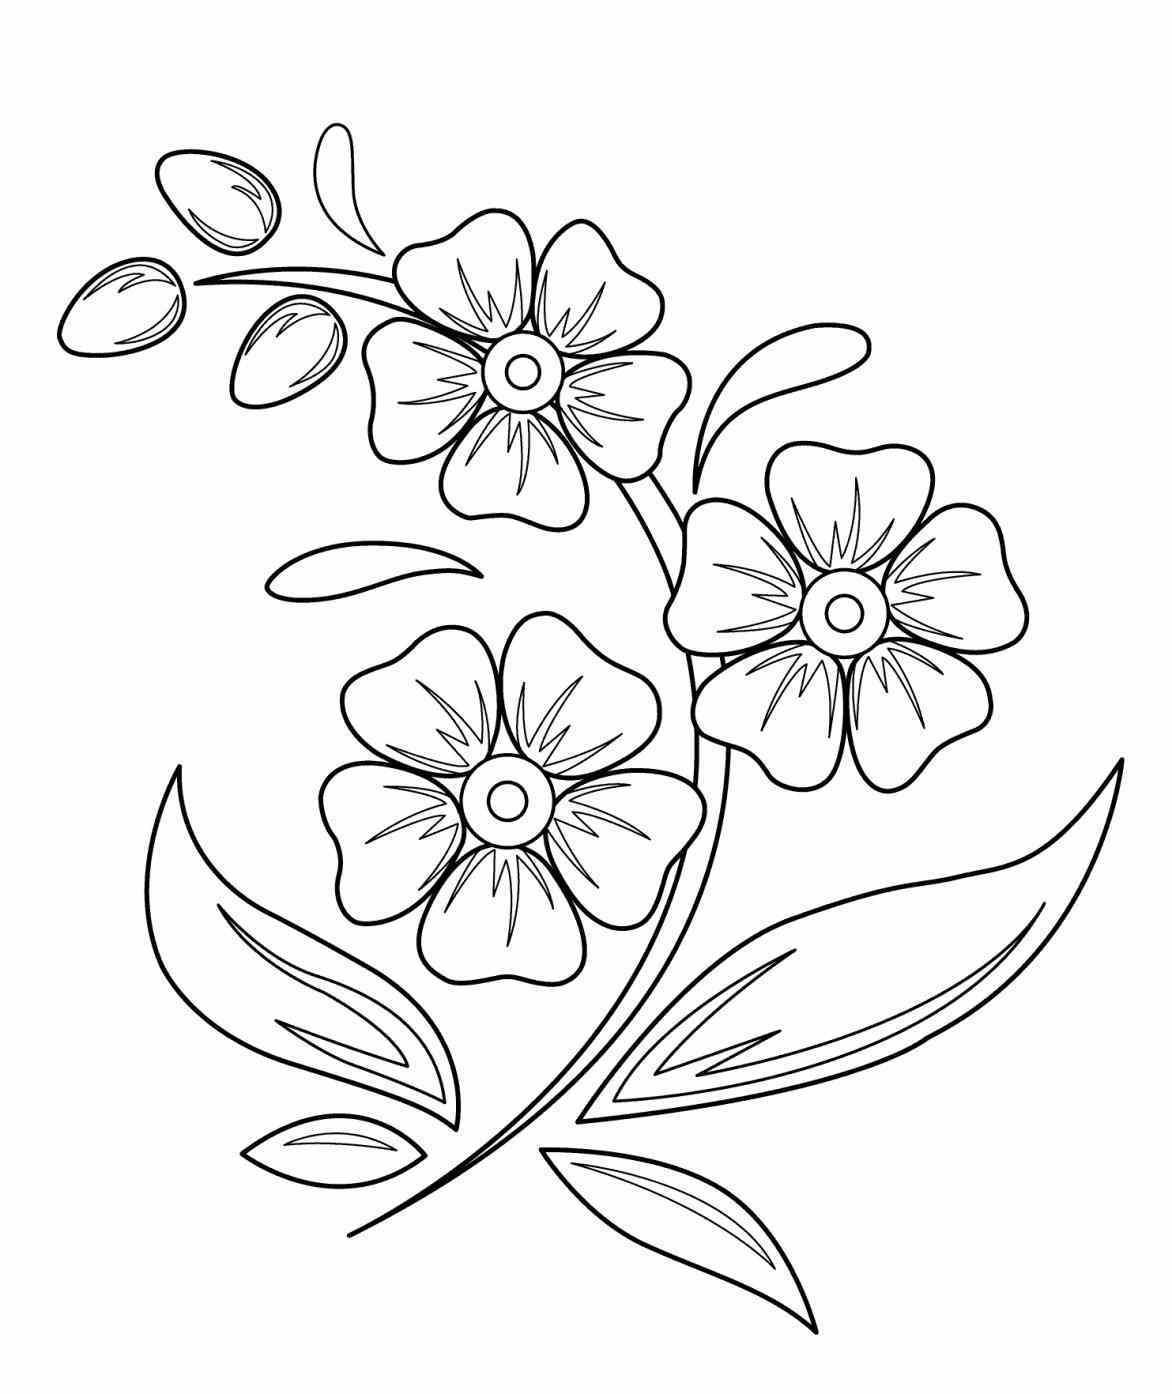 Tropical Flowers Drawing At Getdrawings